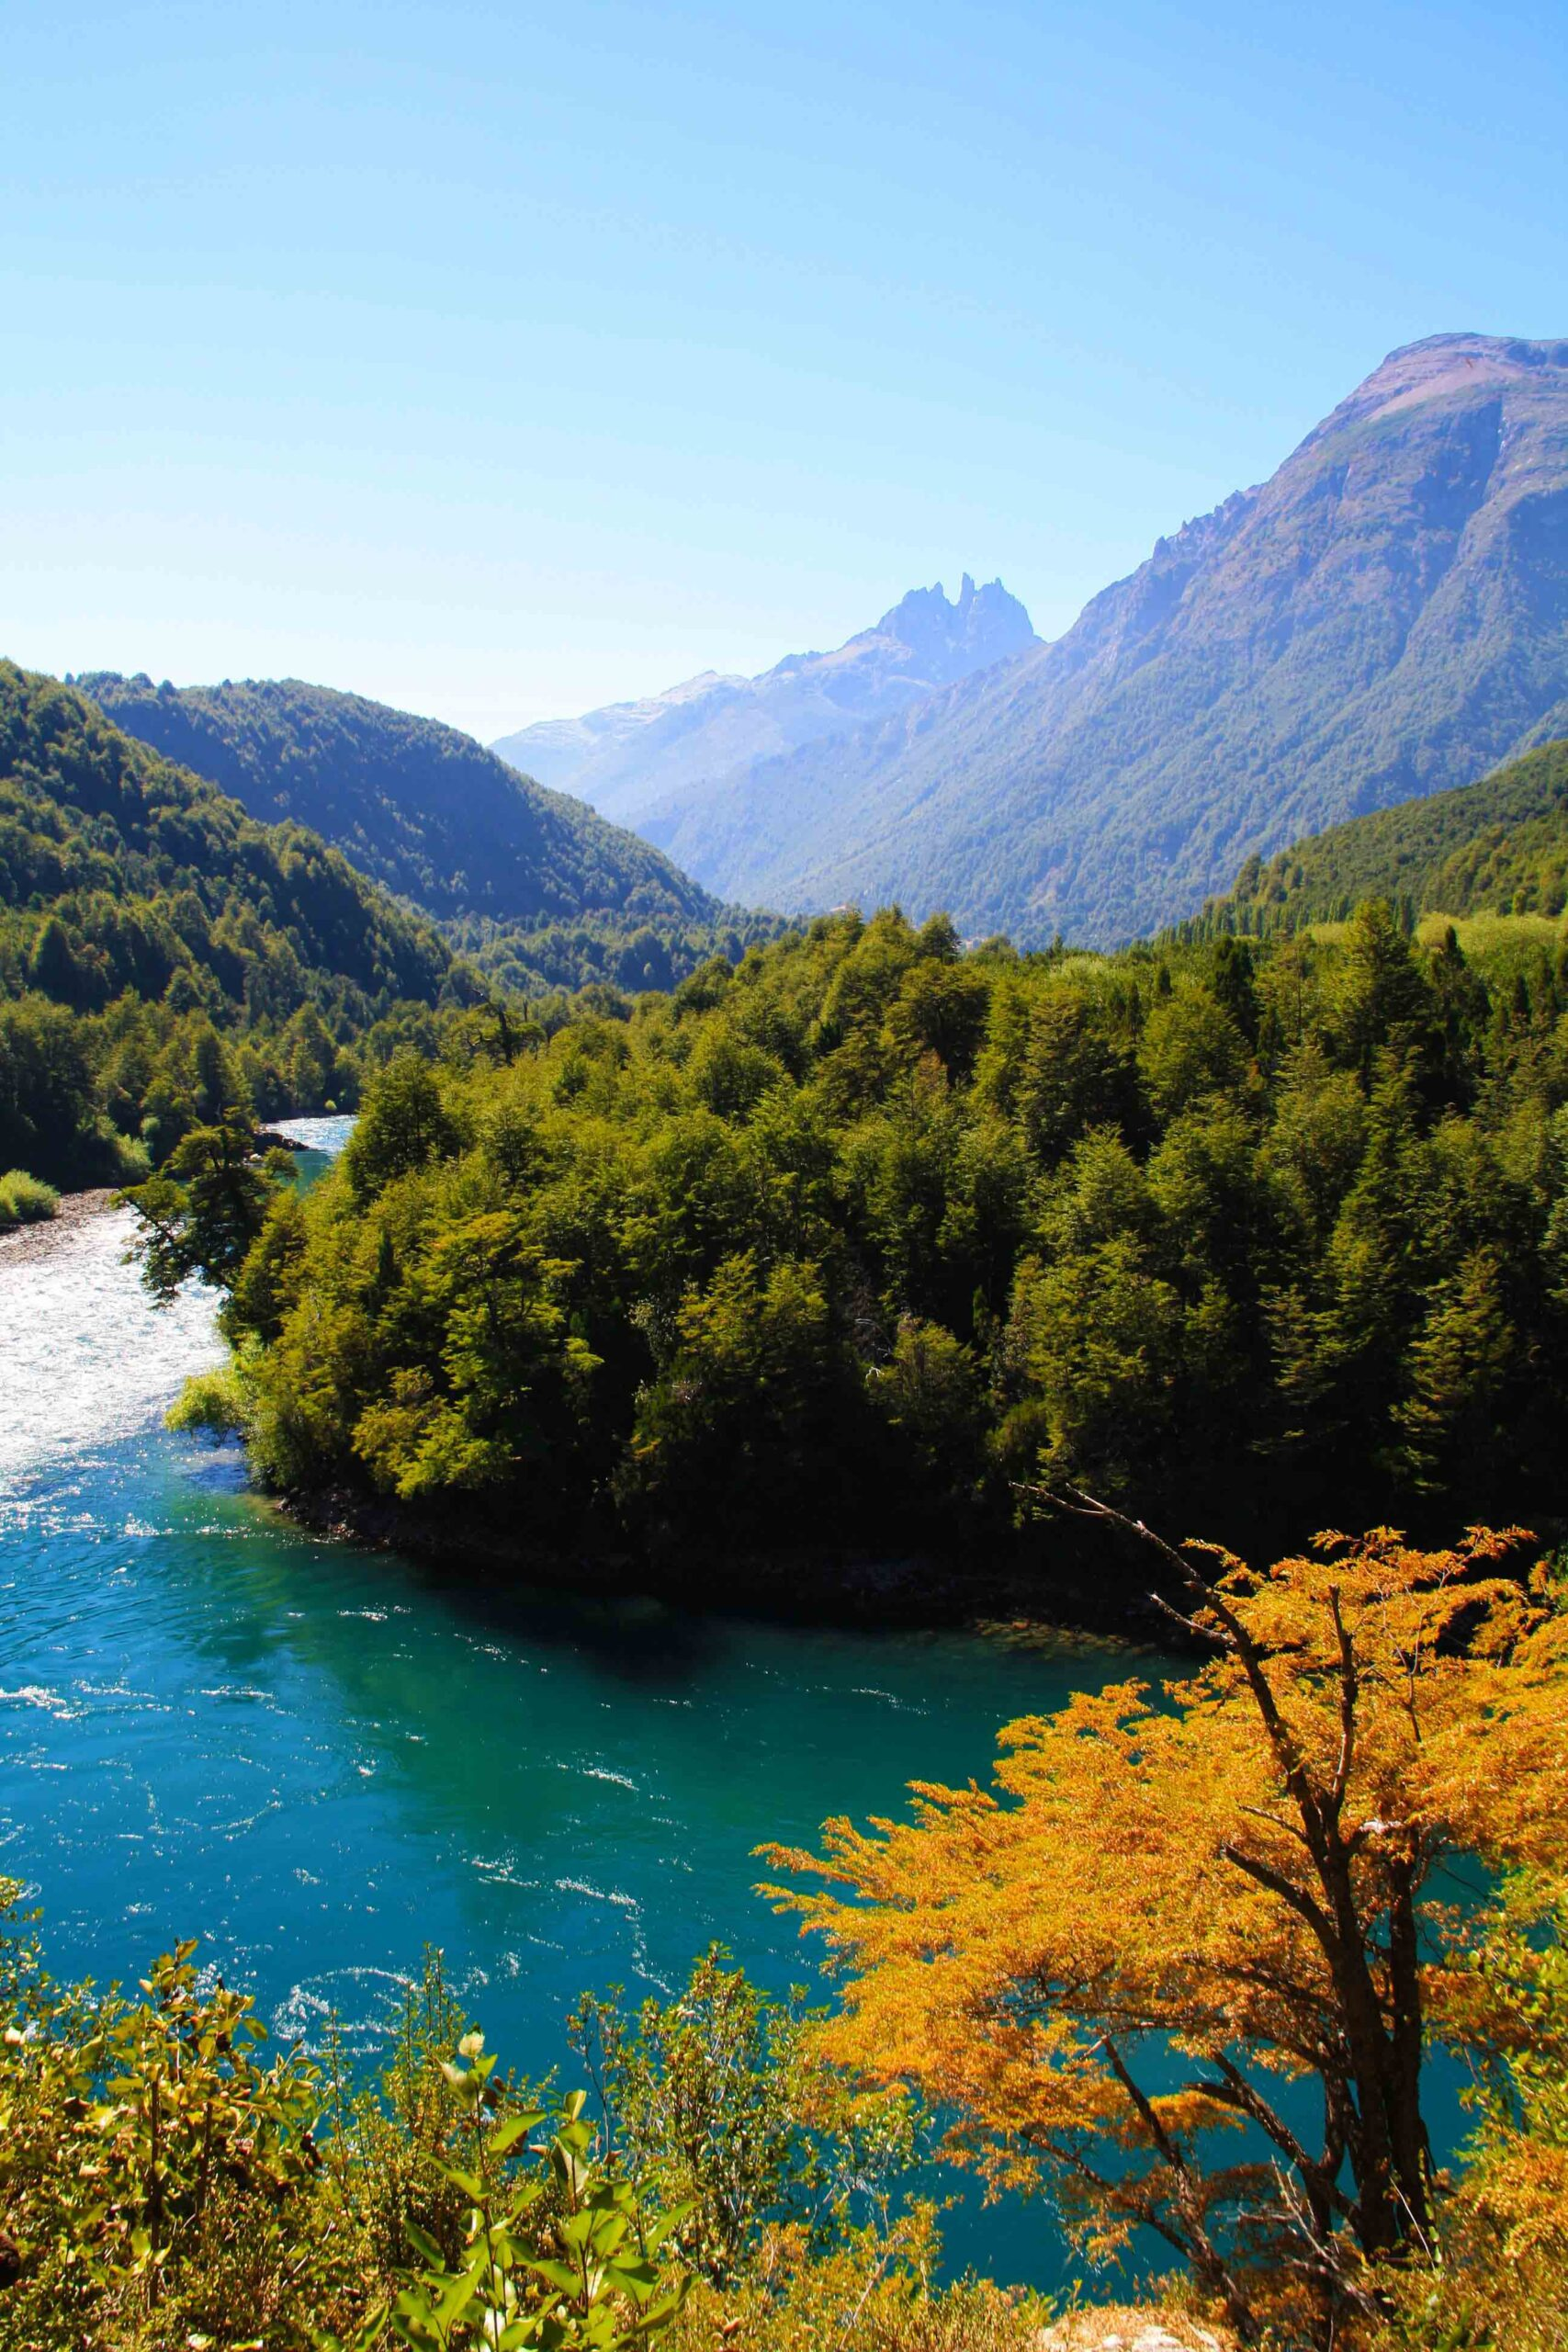 view of futaleufu river on the Carretera Austral in Chile